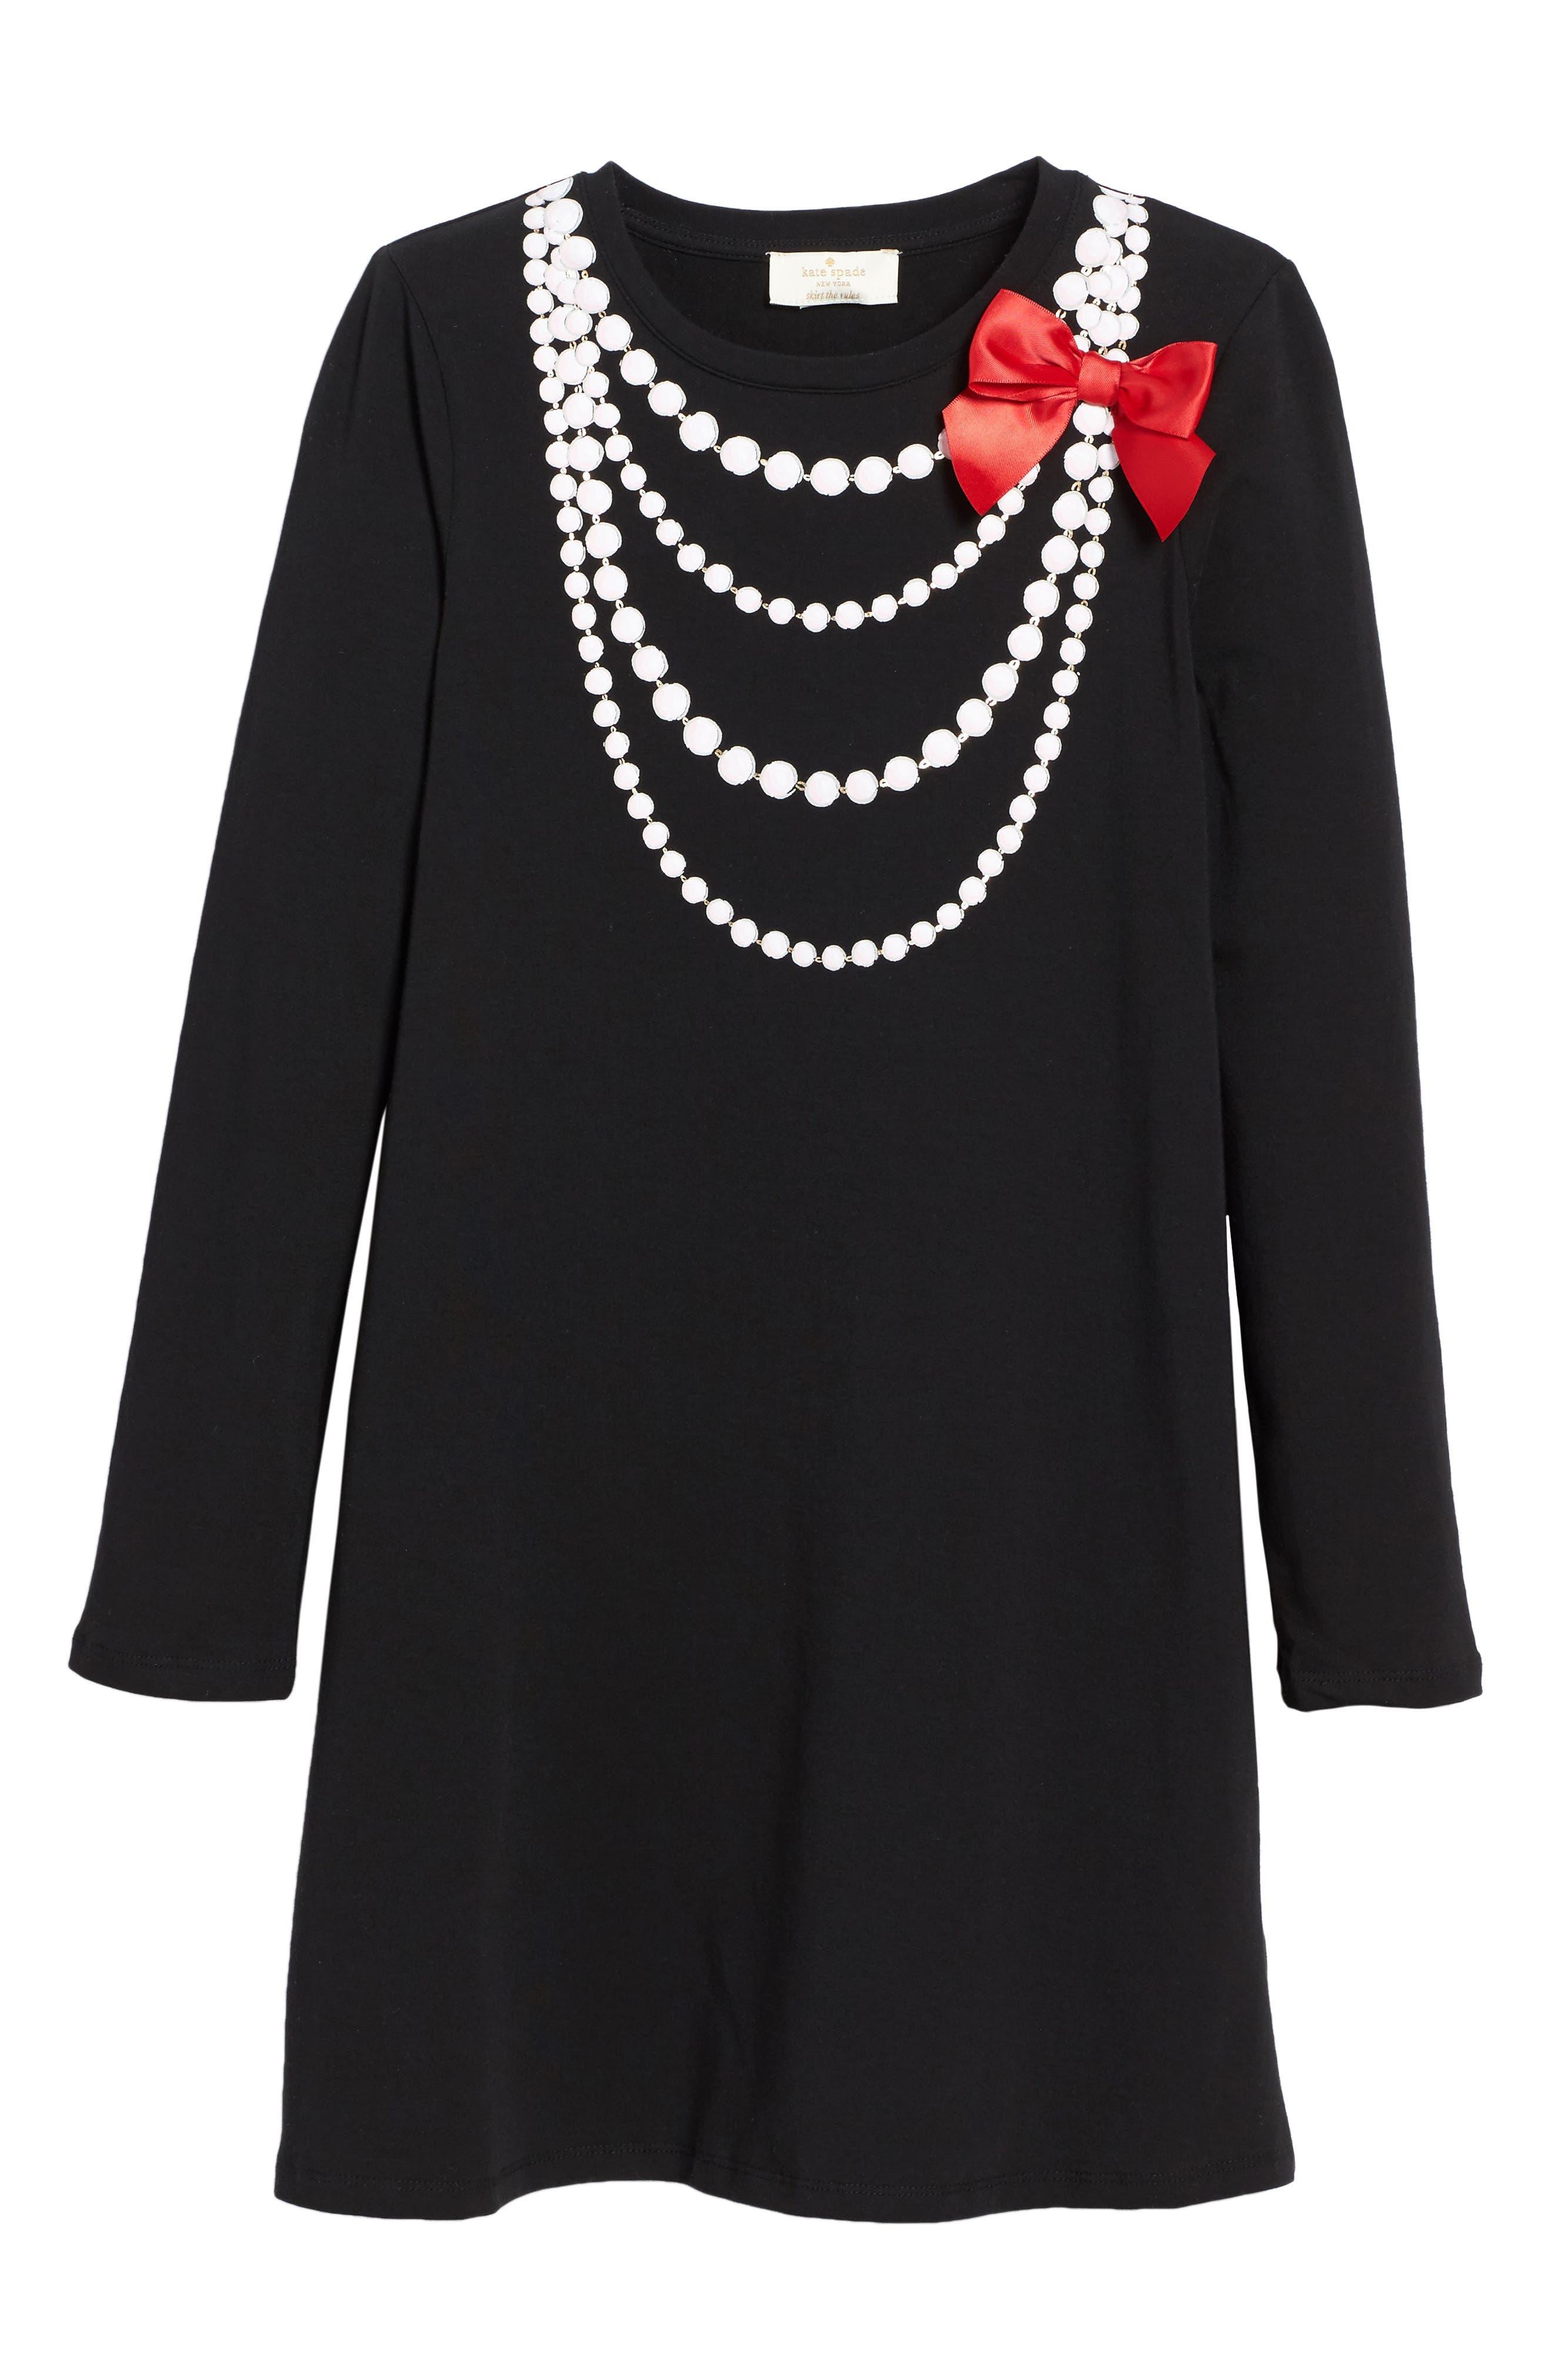 kate spade new york trompe l'oeil necklace dress (Big Girls)